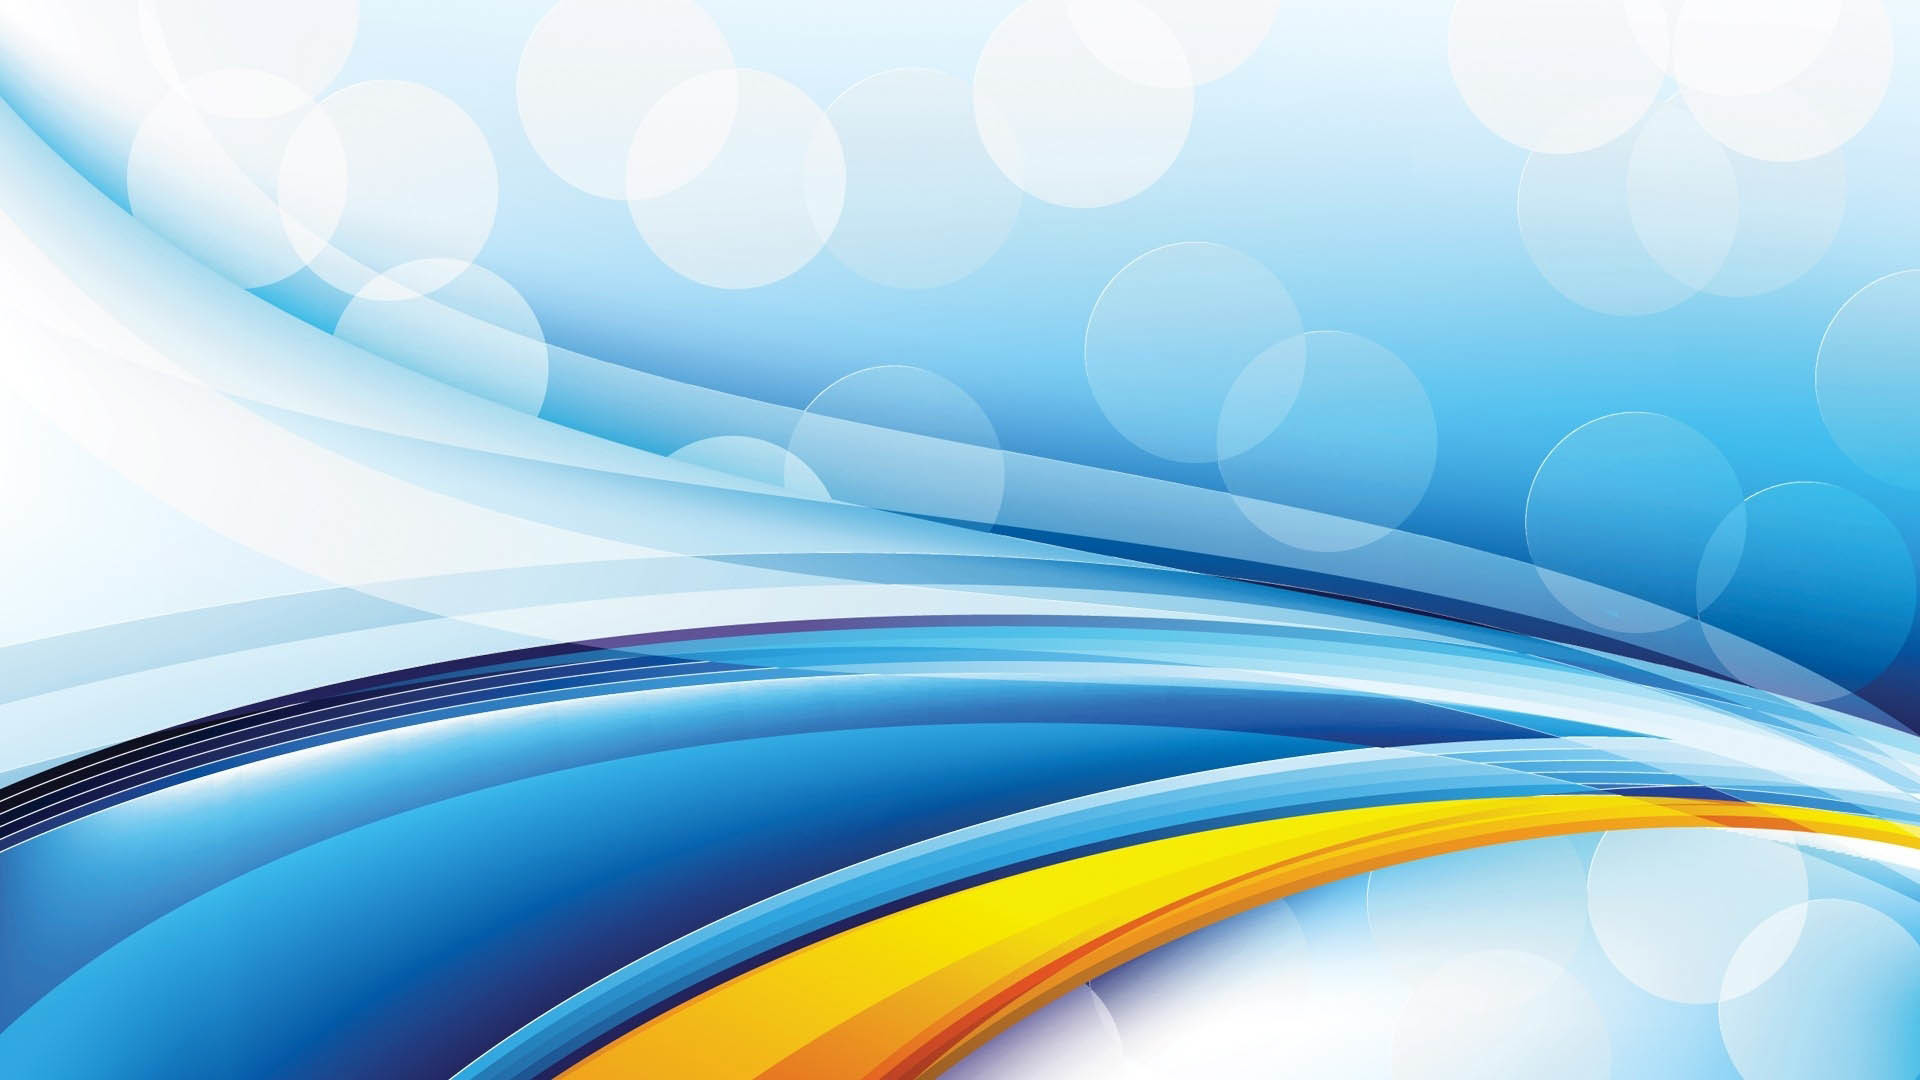 Vector Blue & Yellow Desktop Design wallpaper